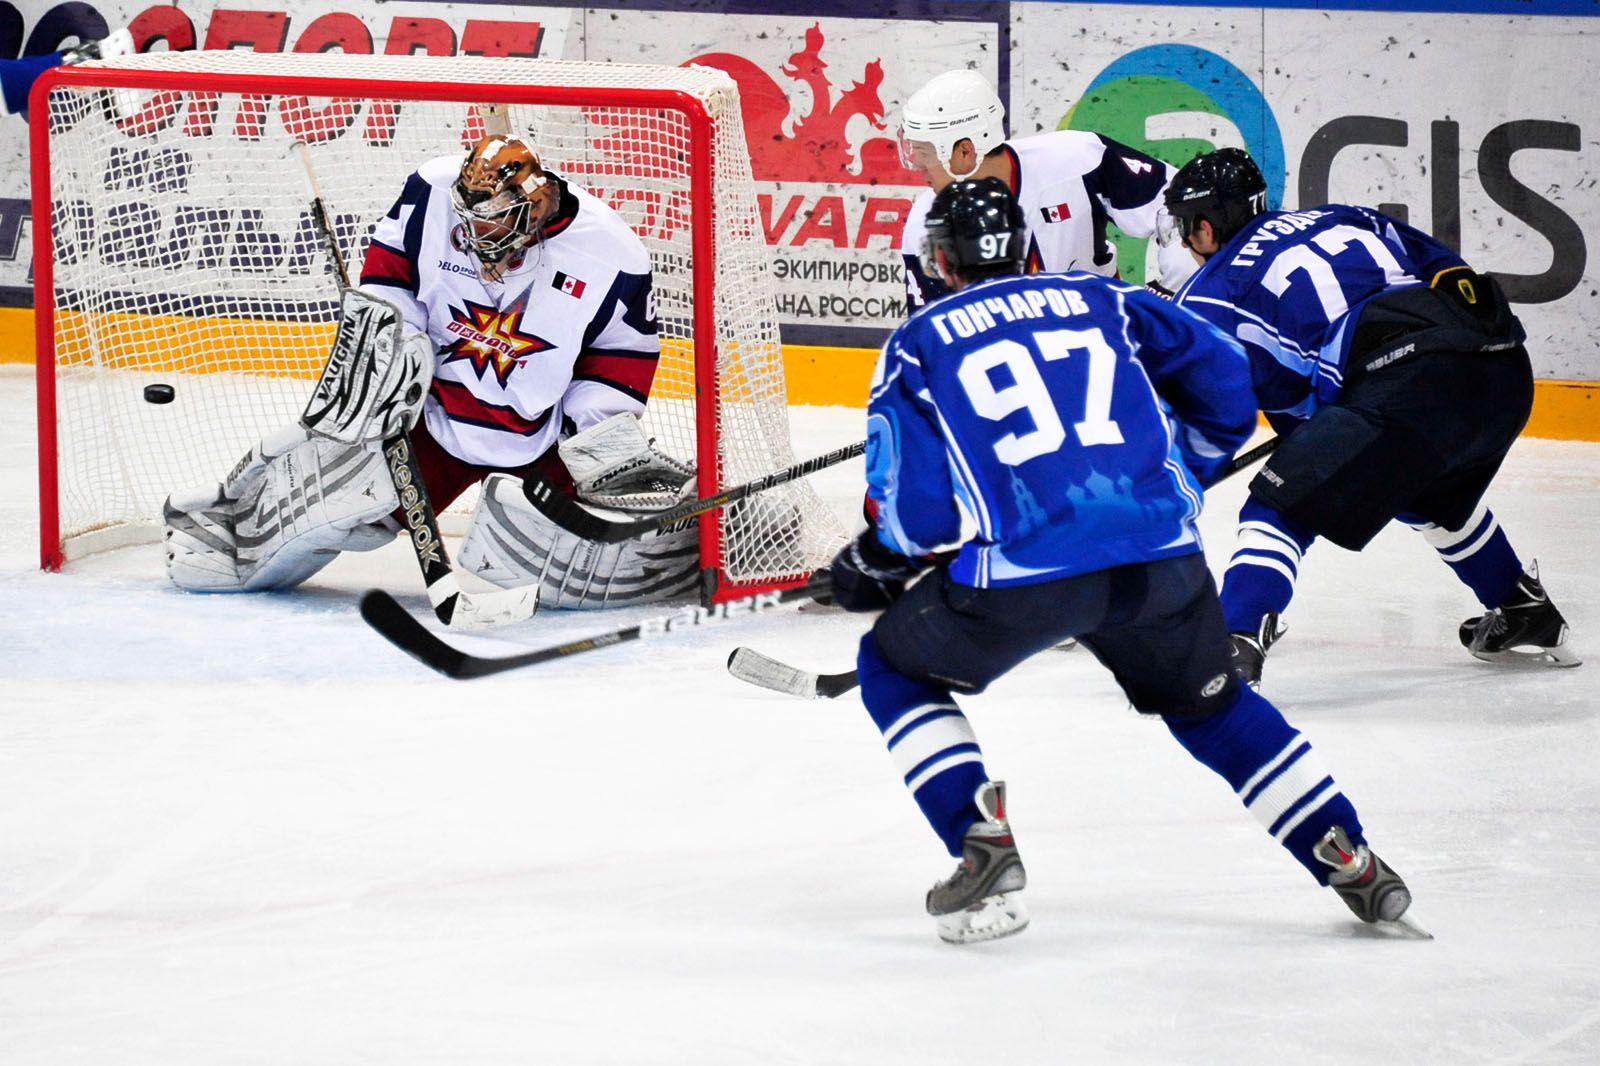 Supreme Hockey League - ХК Рязань - Ижсталь: _DSC9795.jpg